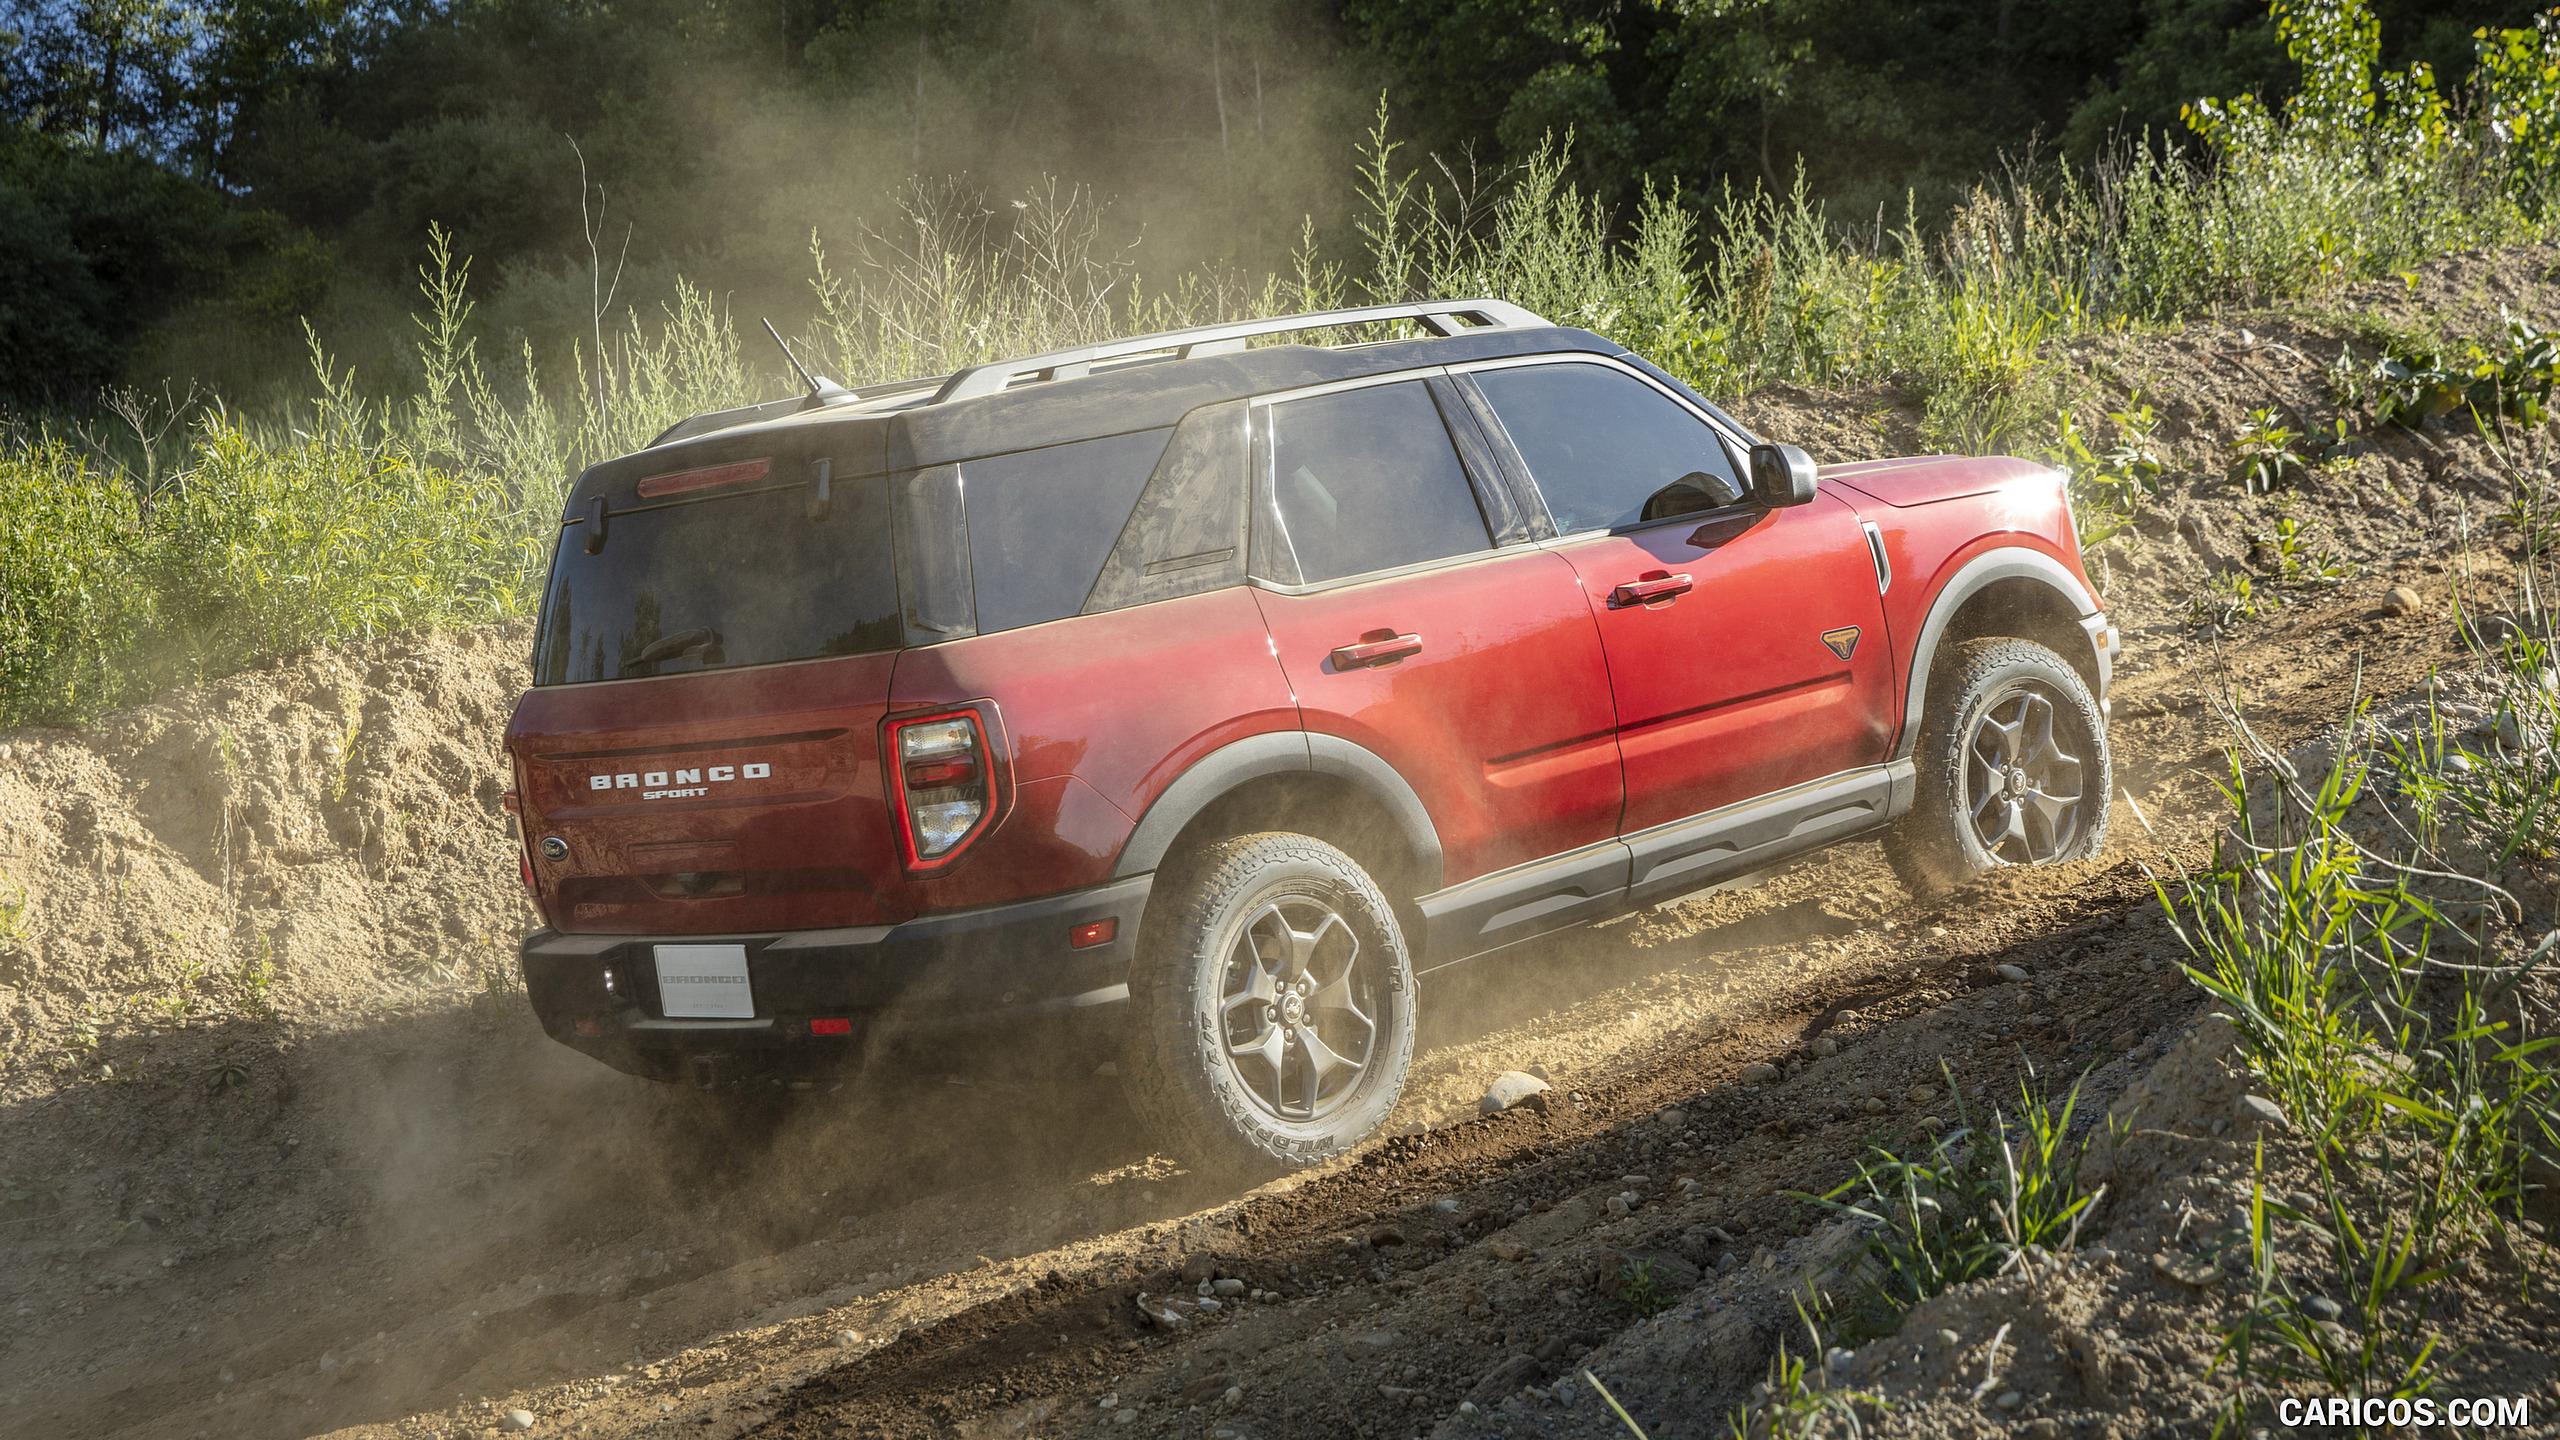 Ford Bronco Rapid Red Metallic